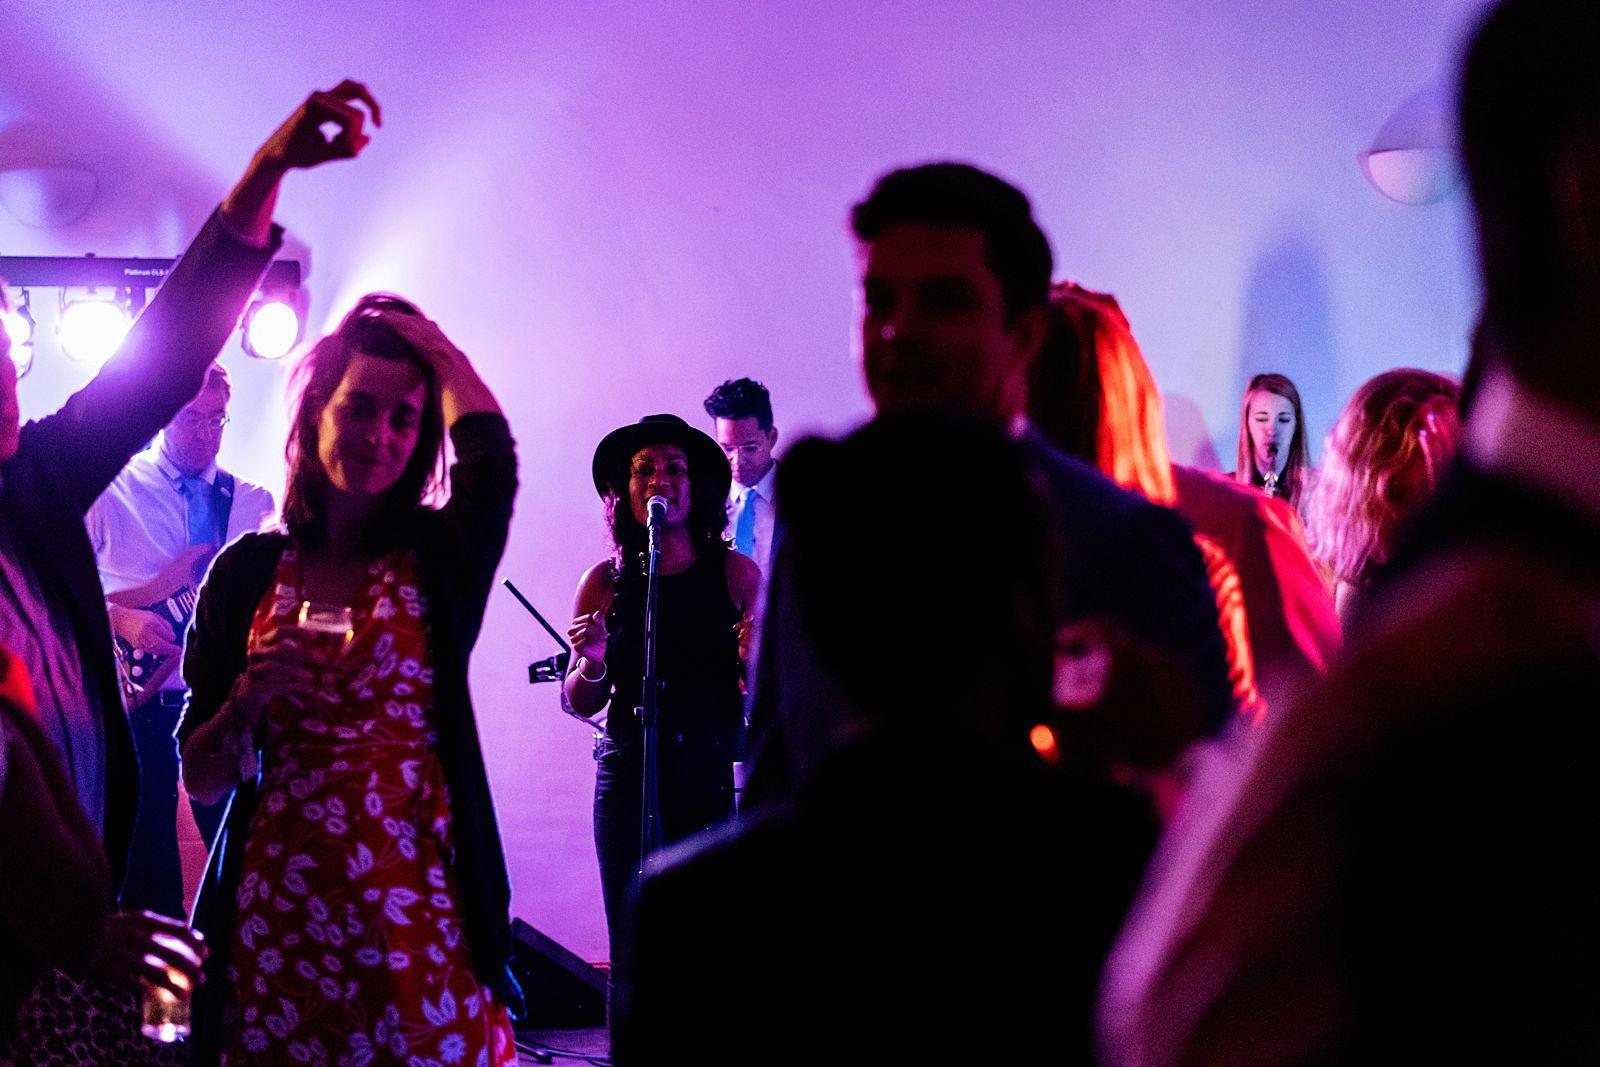 RUUDC Fotografie, fotograaf Ruud, fotograaf Limburg, fotograaf Belgie, trouwen presseux, trouwen chateau presseux, trouwen in belgie, trouwen in het buitenland, bruiloft presseux, trouwfotograaf presseux, bruidsfotograaf presseux, bruidsreportage chateau presseux, trouwreportage chateau presseux, destination wedding fotograaf